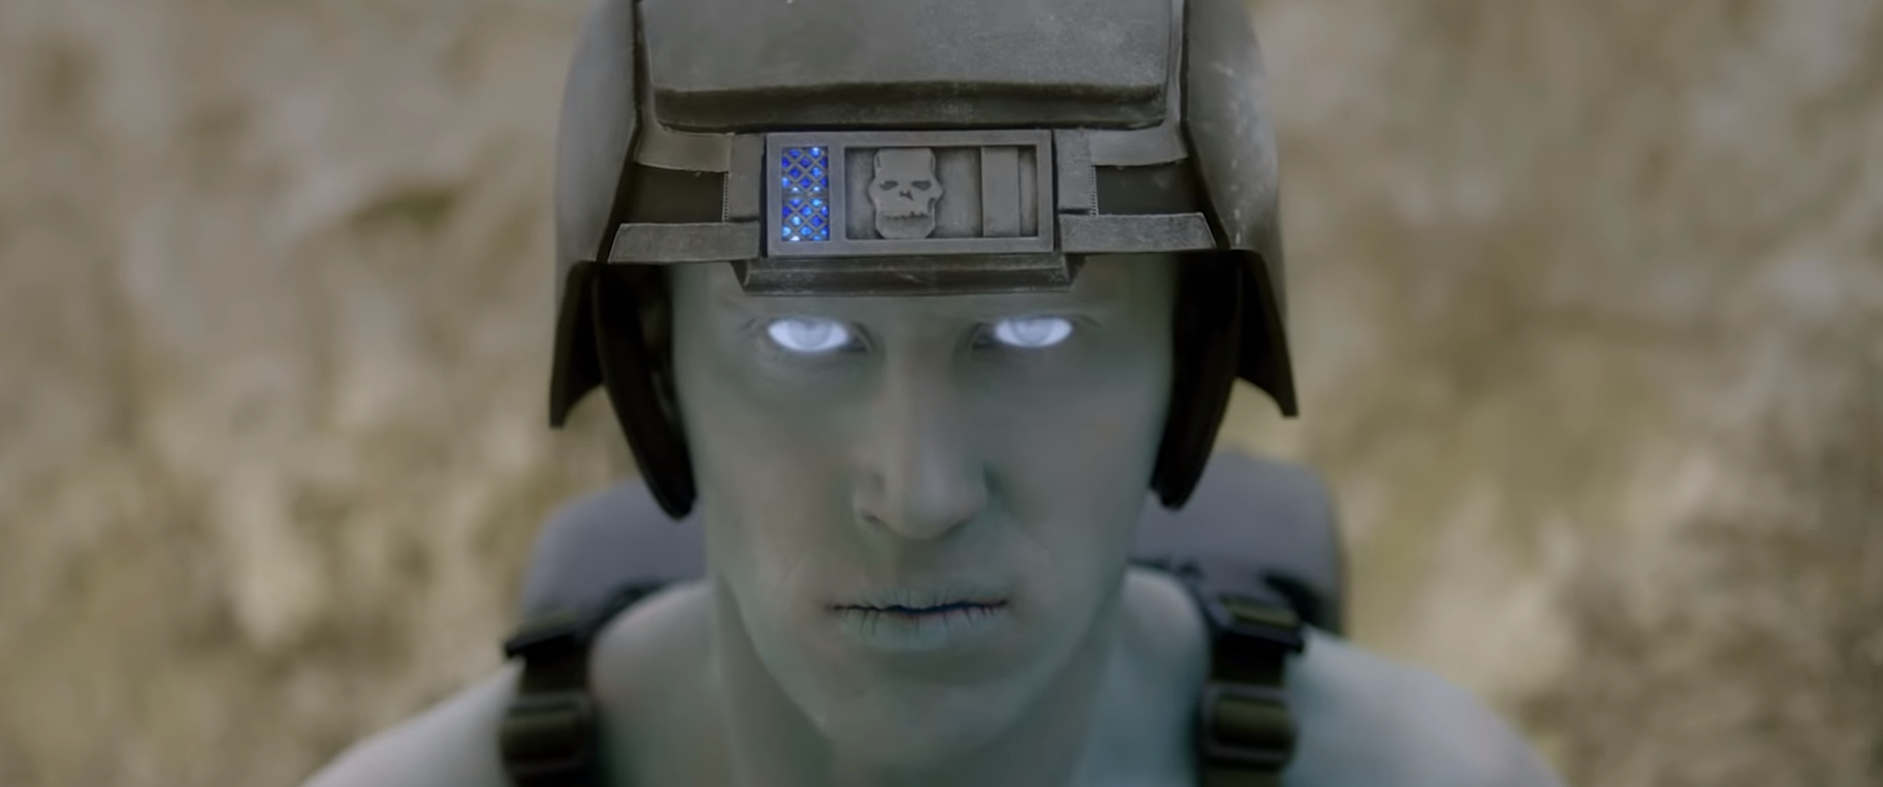 Cool Short – Rogue Trooper: The Quartz Massacre | Live for Films